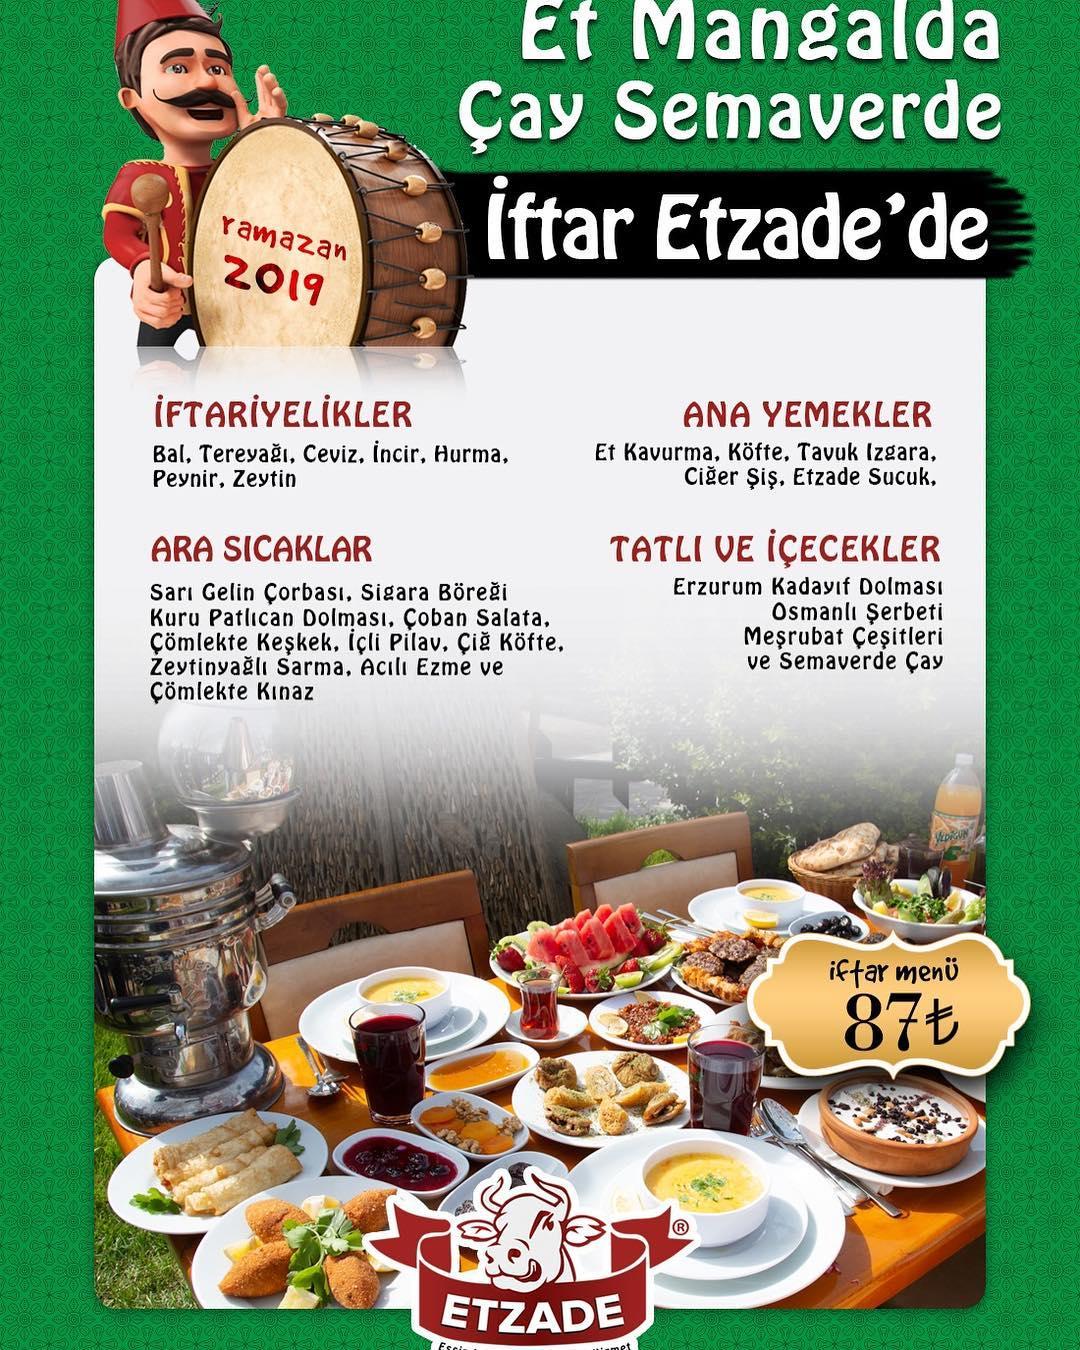 etzade et mangal restaurant kahvaltı arnavutköy iftar mekanları arnavutköy iftar menüsü